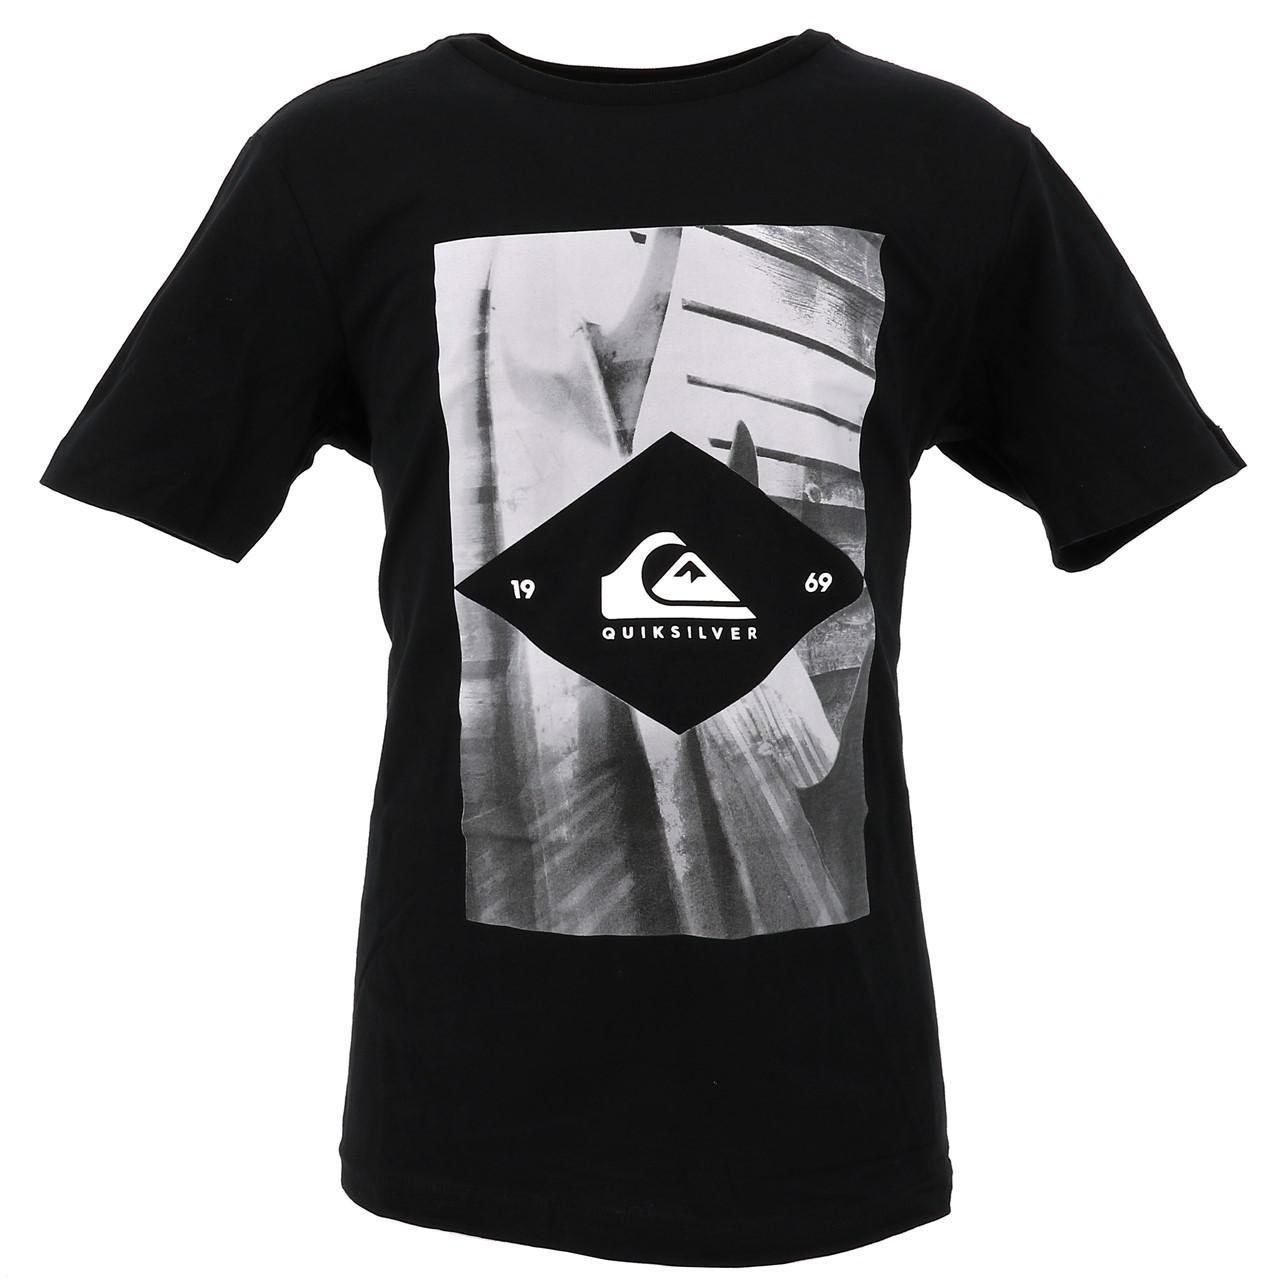 Tee-shirt-manches-courtes-Quiksilver-15341-flaxton-blk-jr-sp2-Noir-17517-Neuf